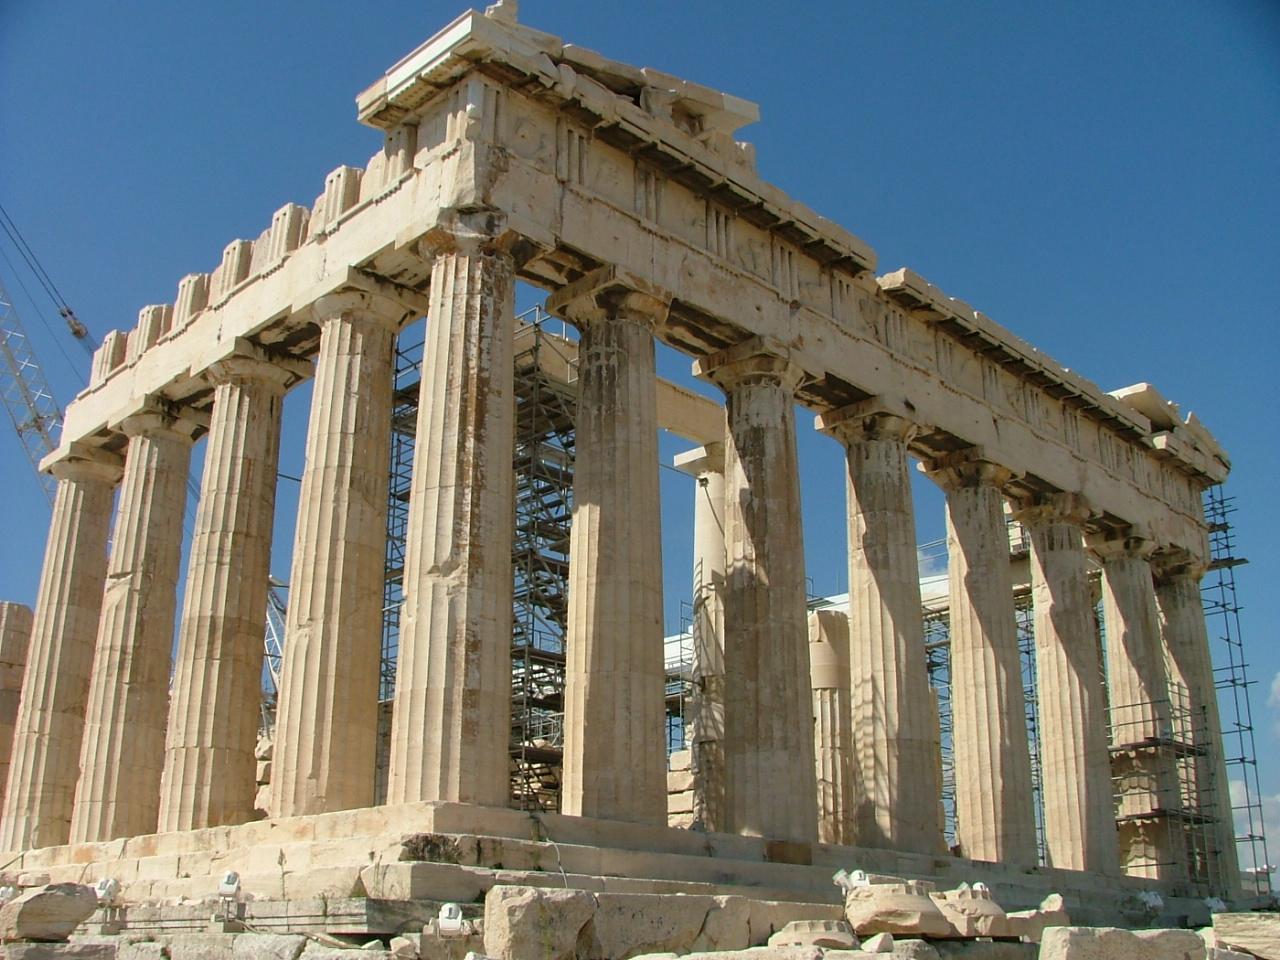 Tag афинская демократия harijs tumans